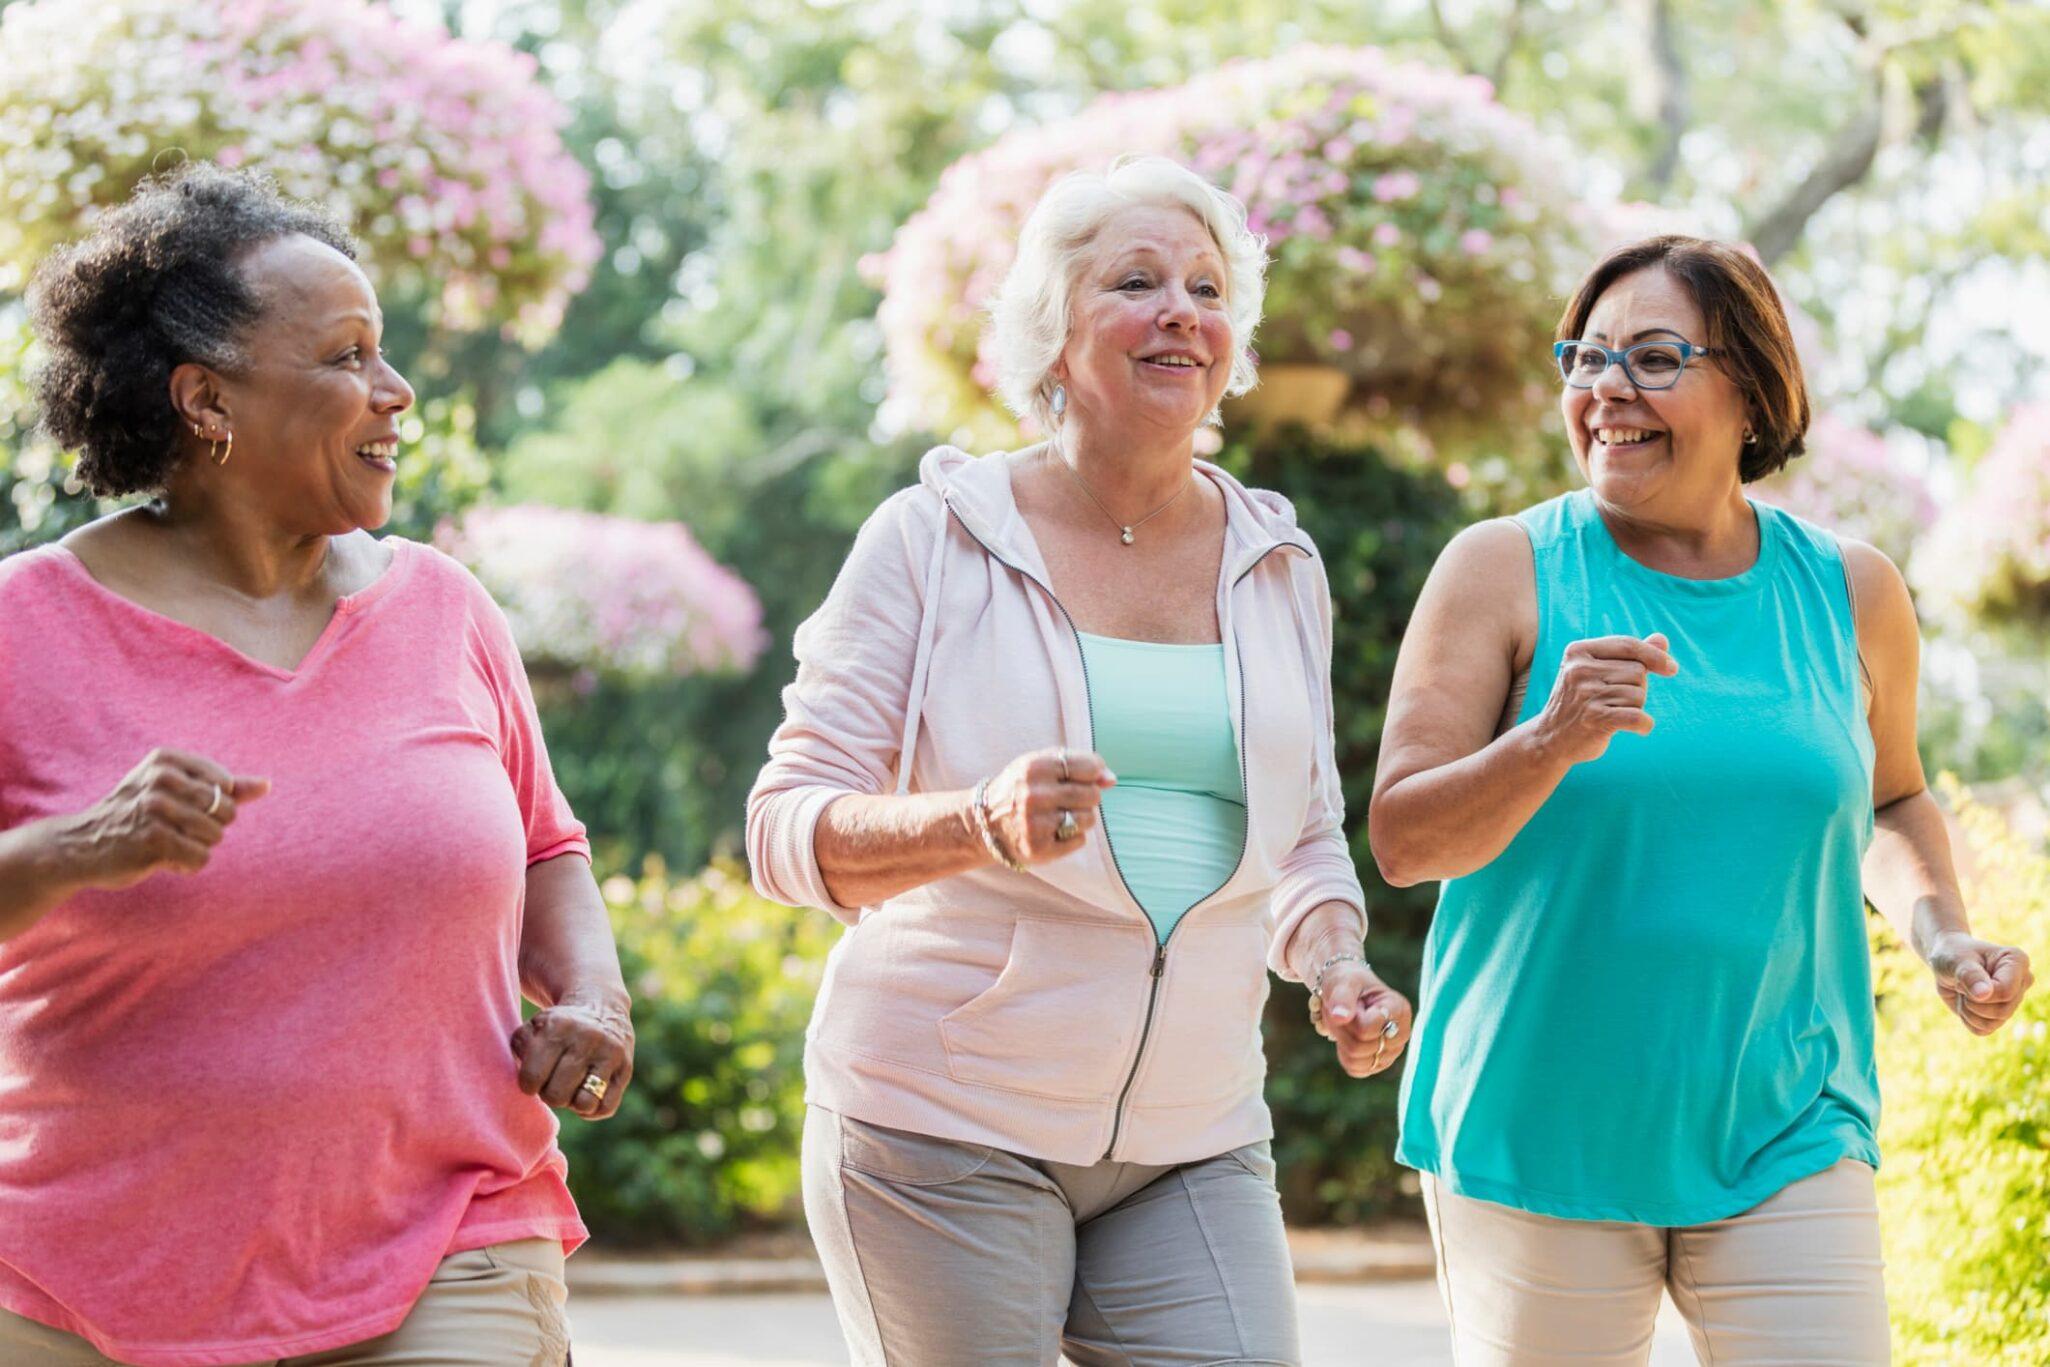 Three older women walking together outside.